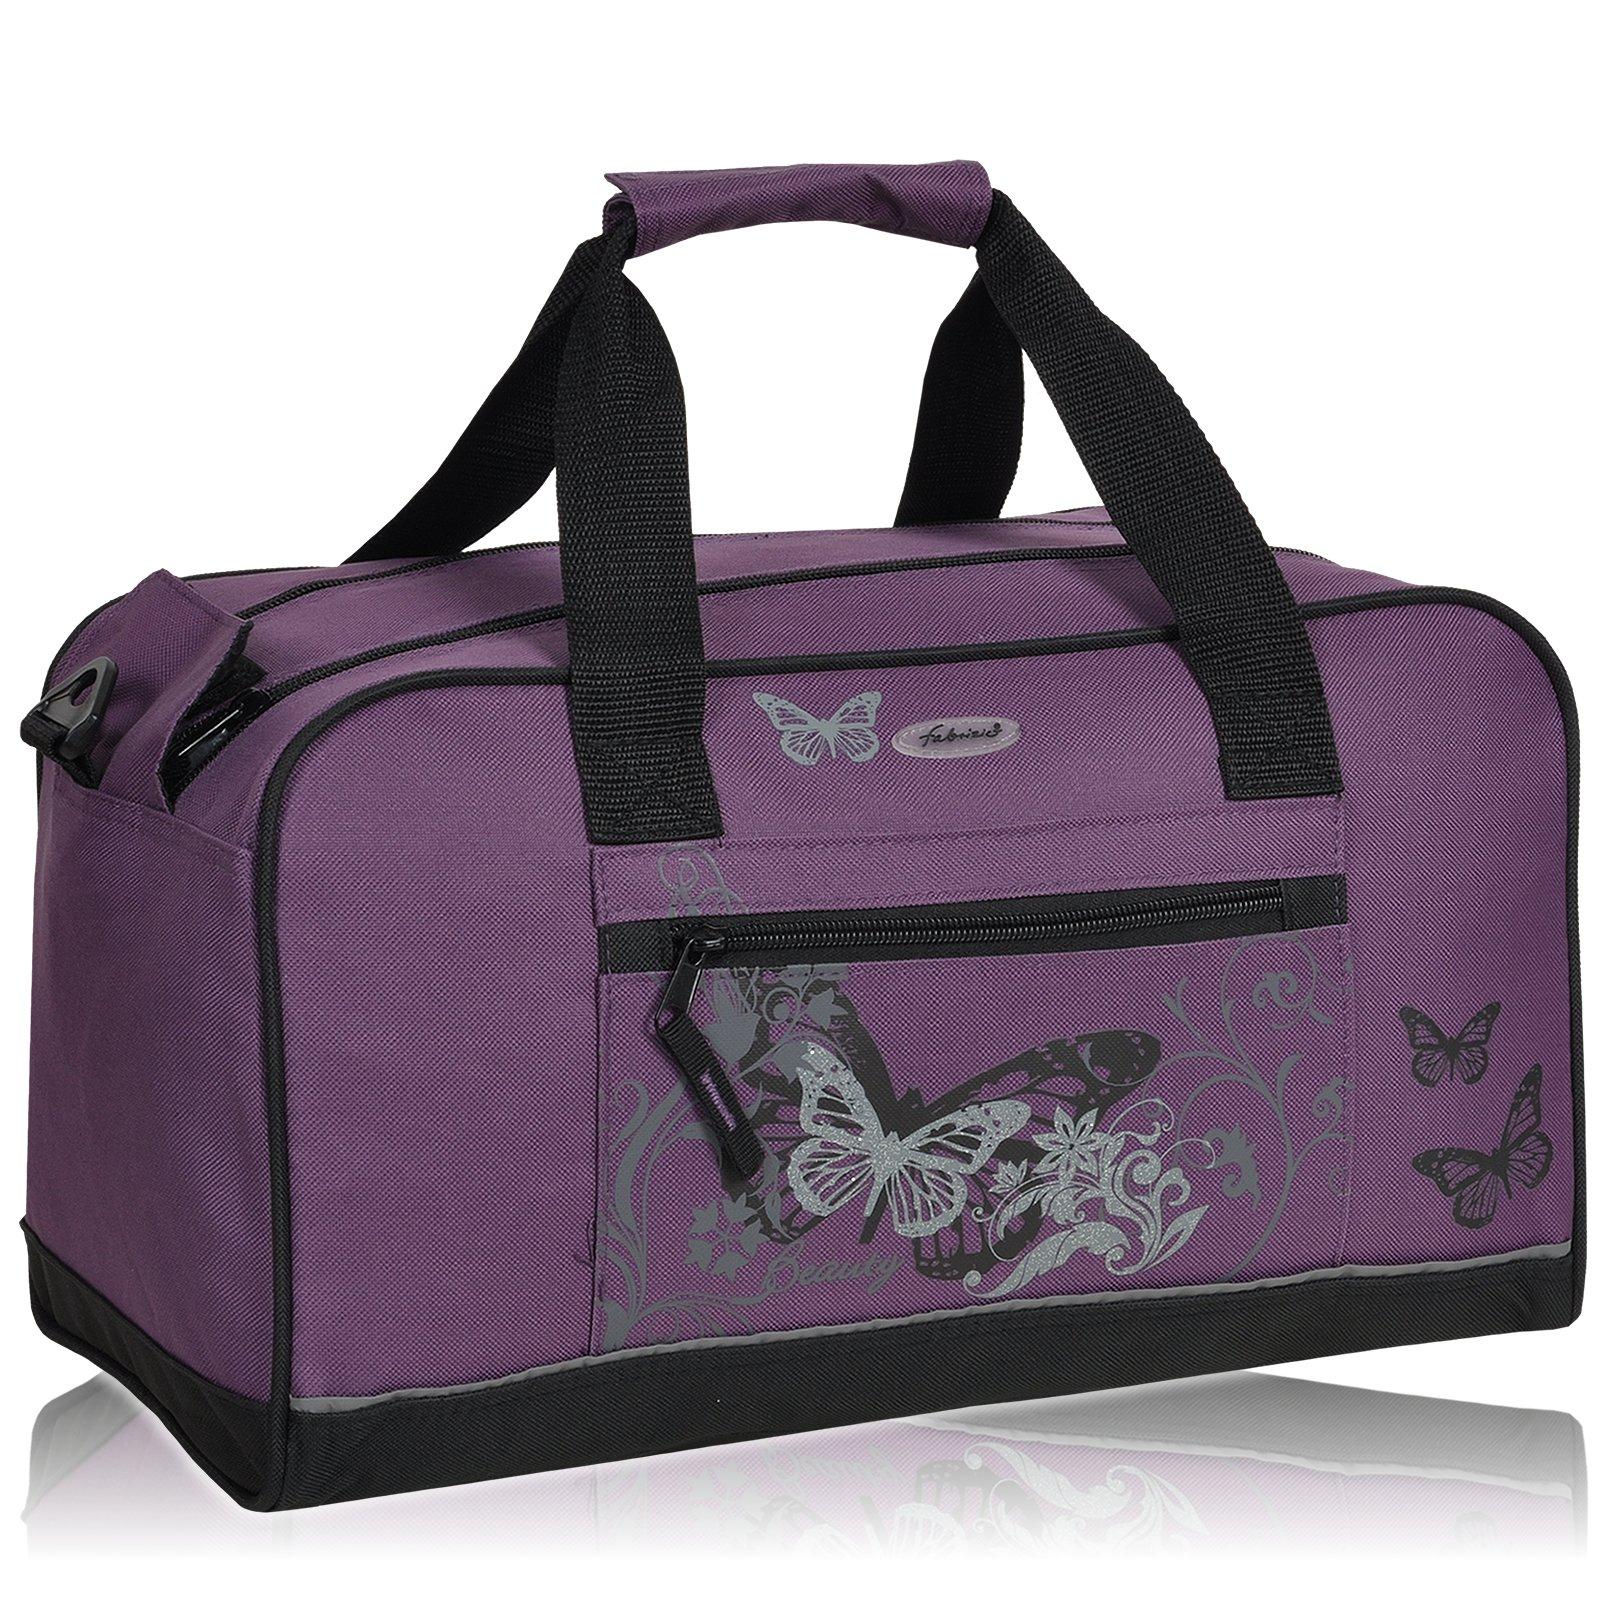 b69da2d1ffcee FABRIZIO BUTTERFLY Sporttasche Beauty Schulsporttasche Sport Tasche      Lila product image